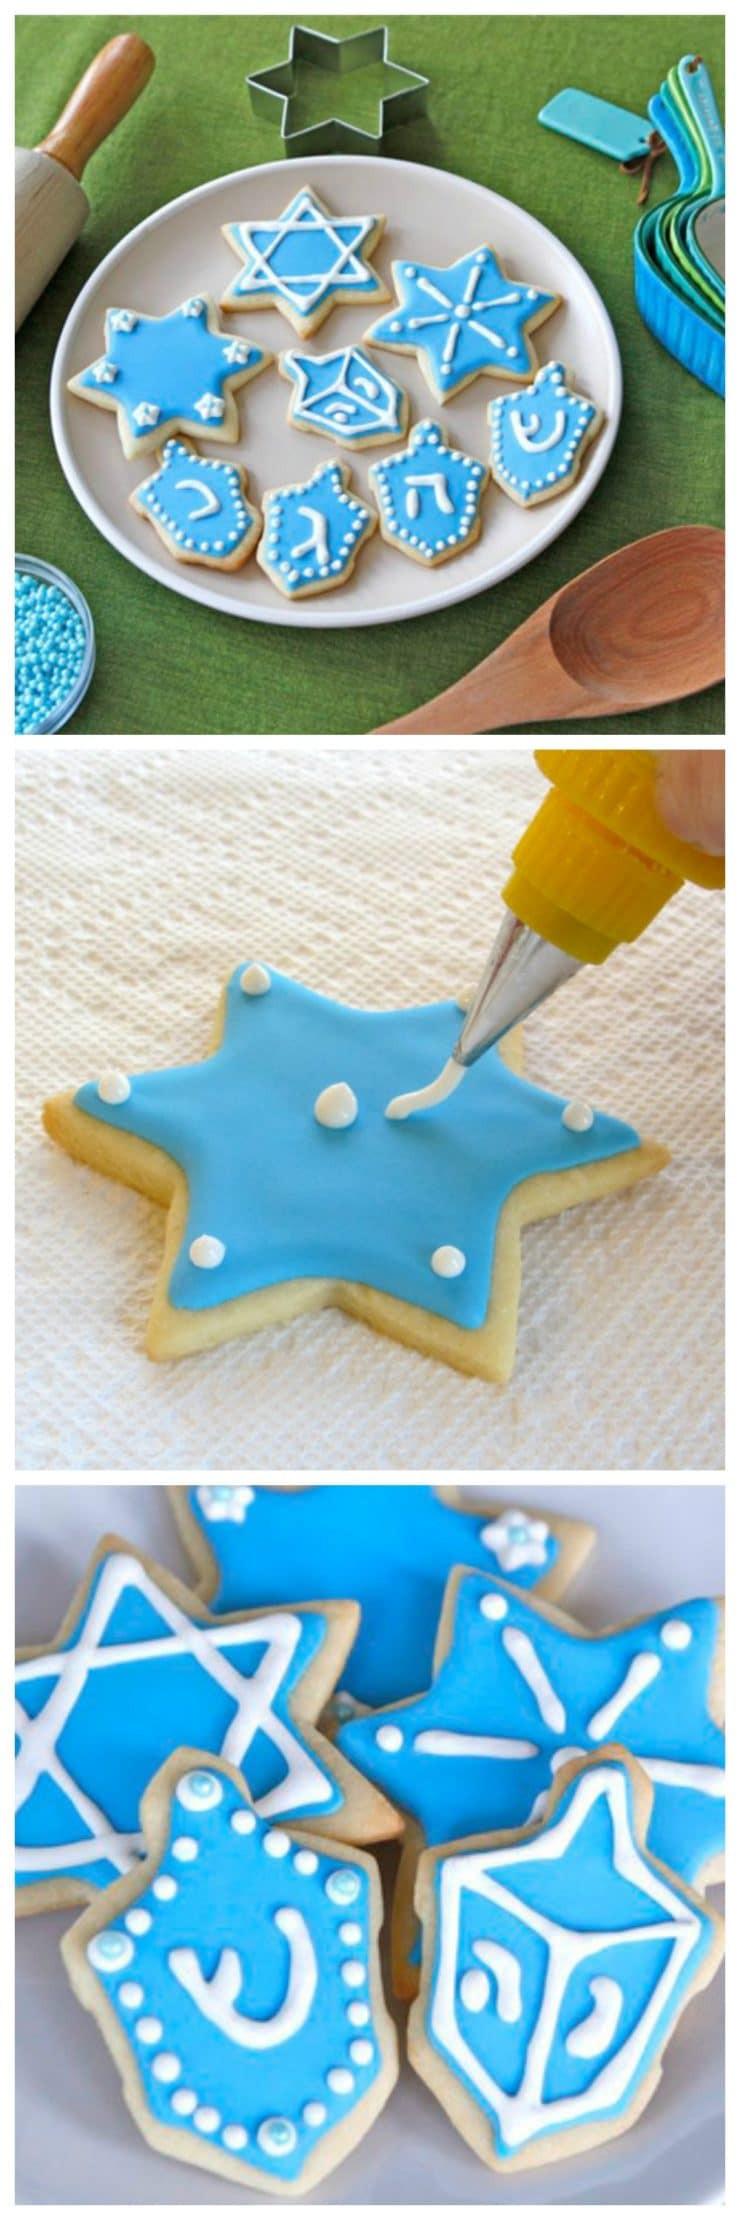 Hanukkah Sugar Cookies  Hanukkah Holiday Sugar Cookies Decorate with Royal Icing